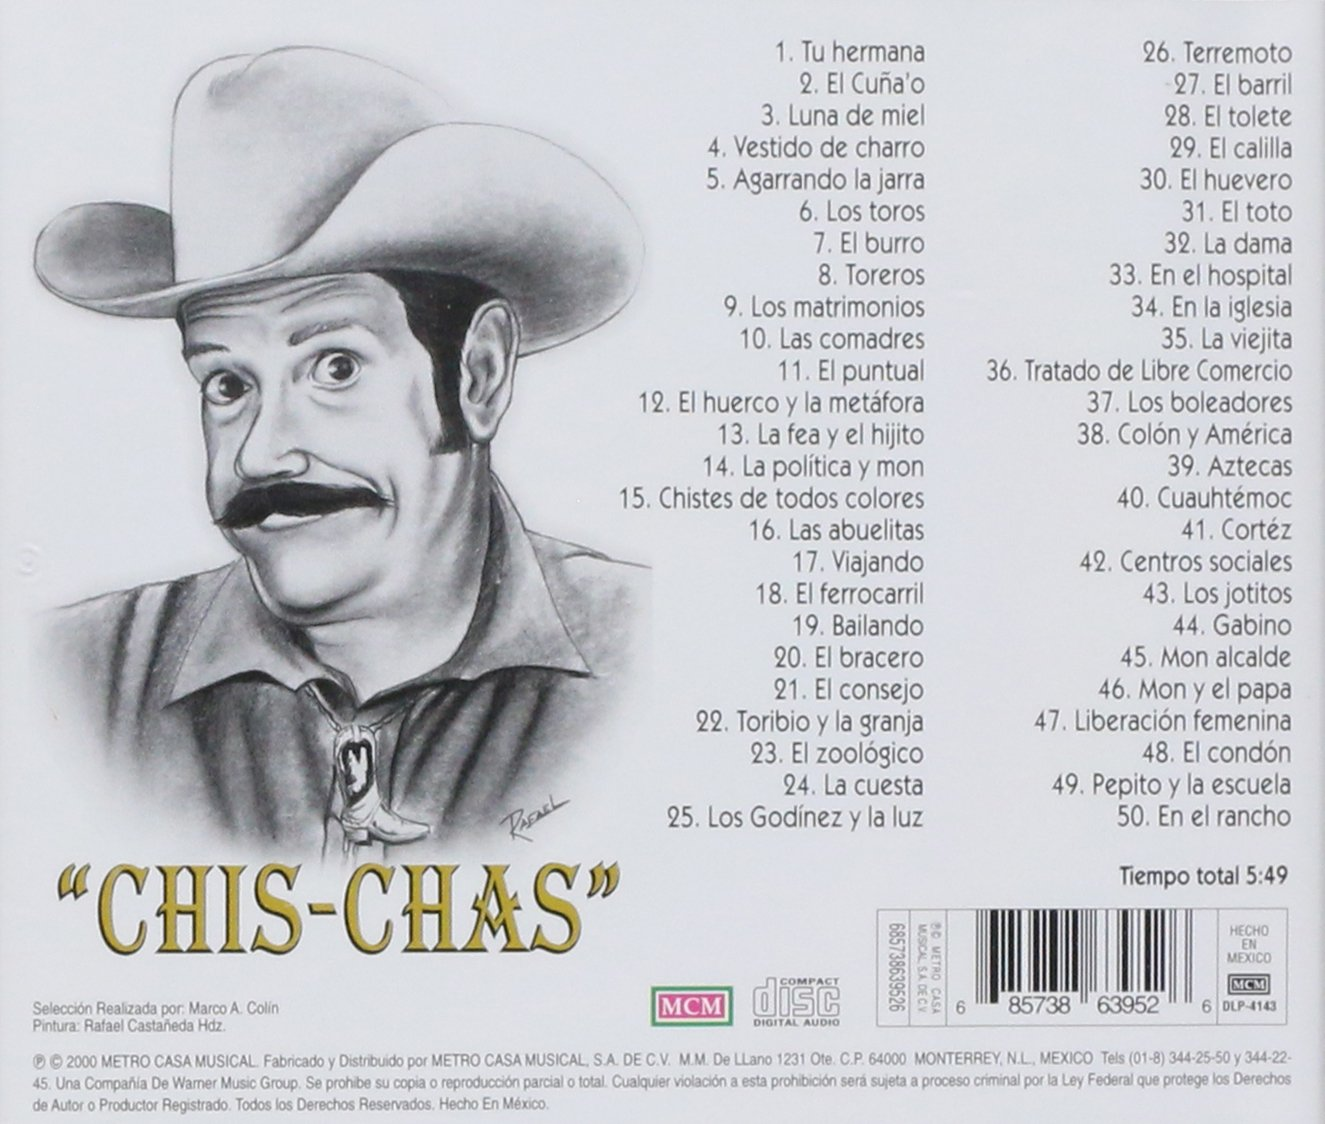 Jesus Gonzalez, Jesus Gonsales. Chi-Chas - Jusus Gonzalez